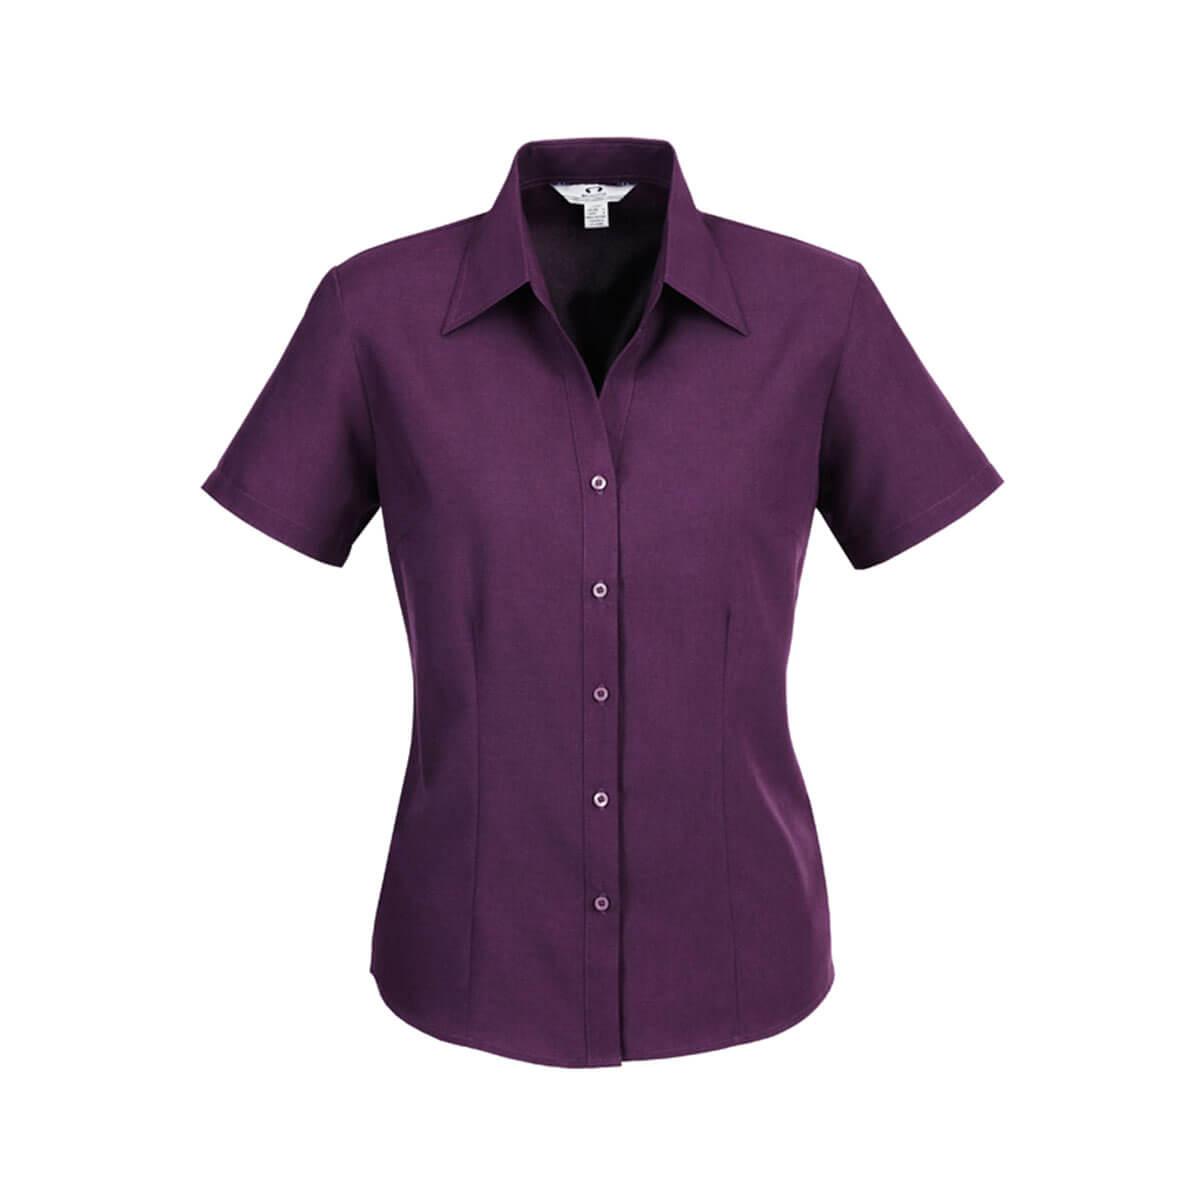 Ladies Plain Oasis Short Sleeve Shirt-Grape